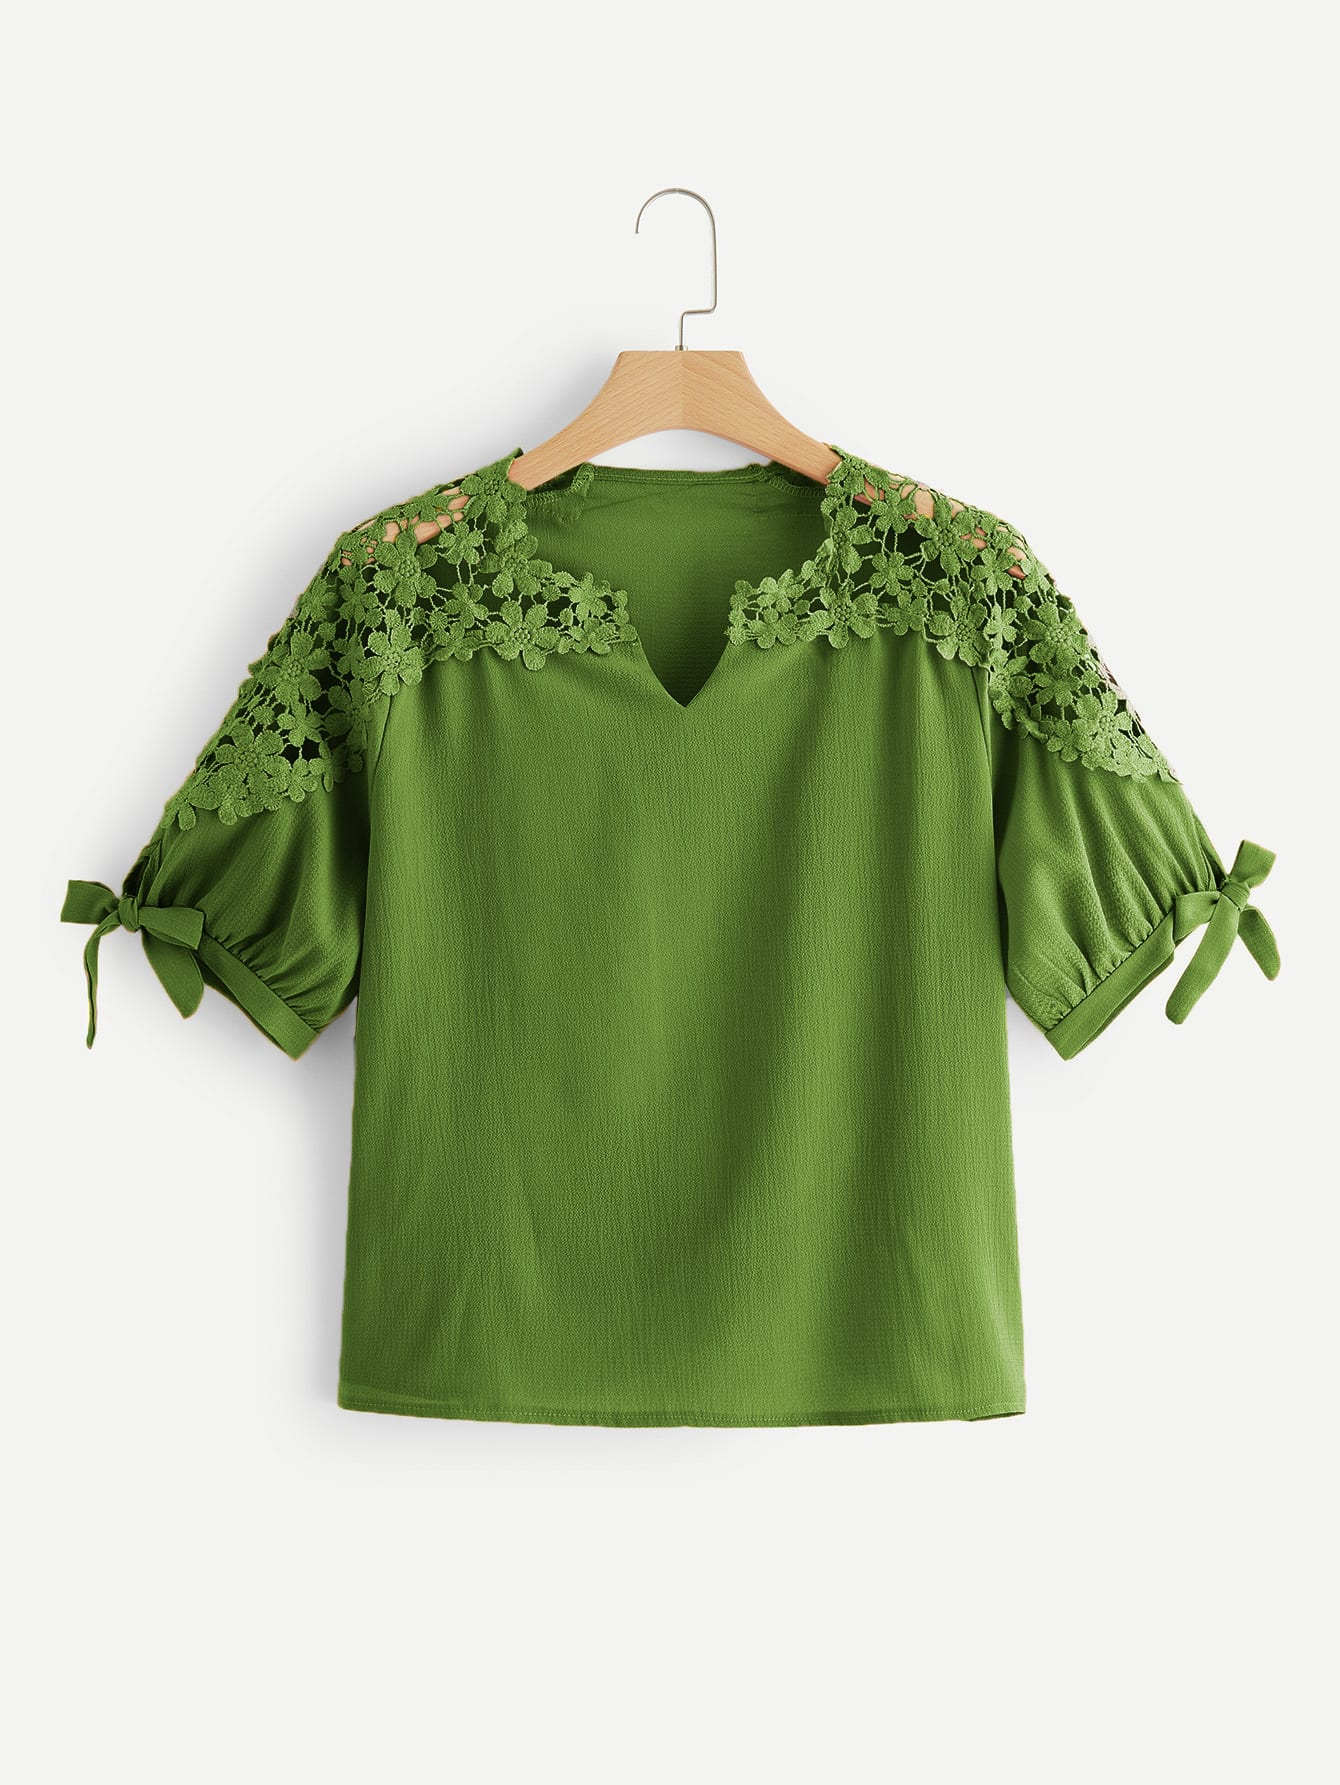 Фото - Кружевная блуза размера плюс с узлом на манжетах от SheIn цвет зелёные